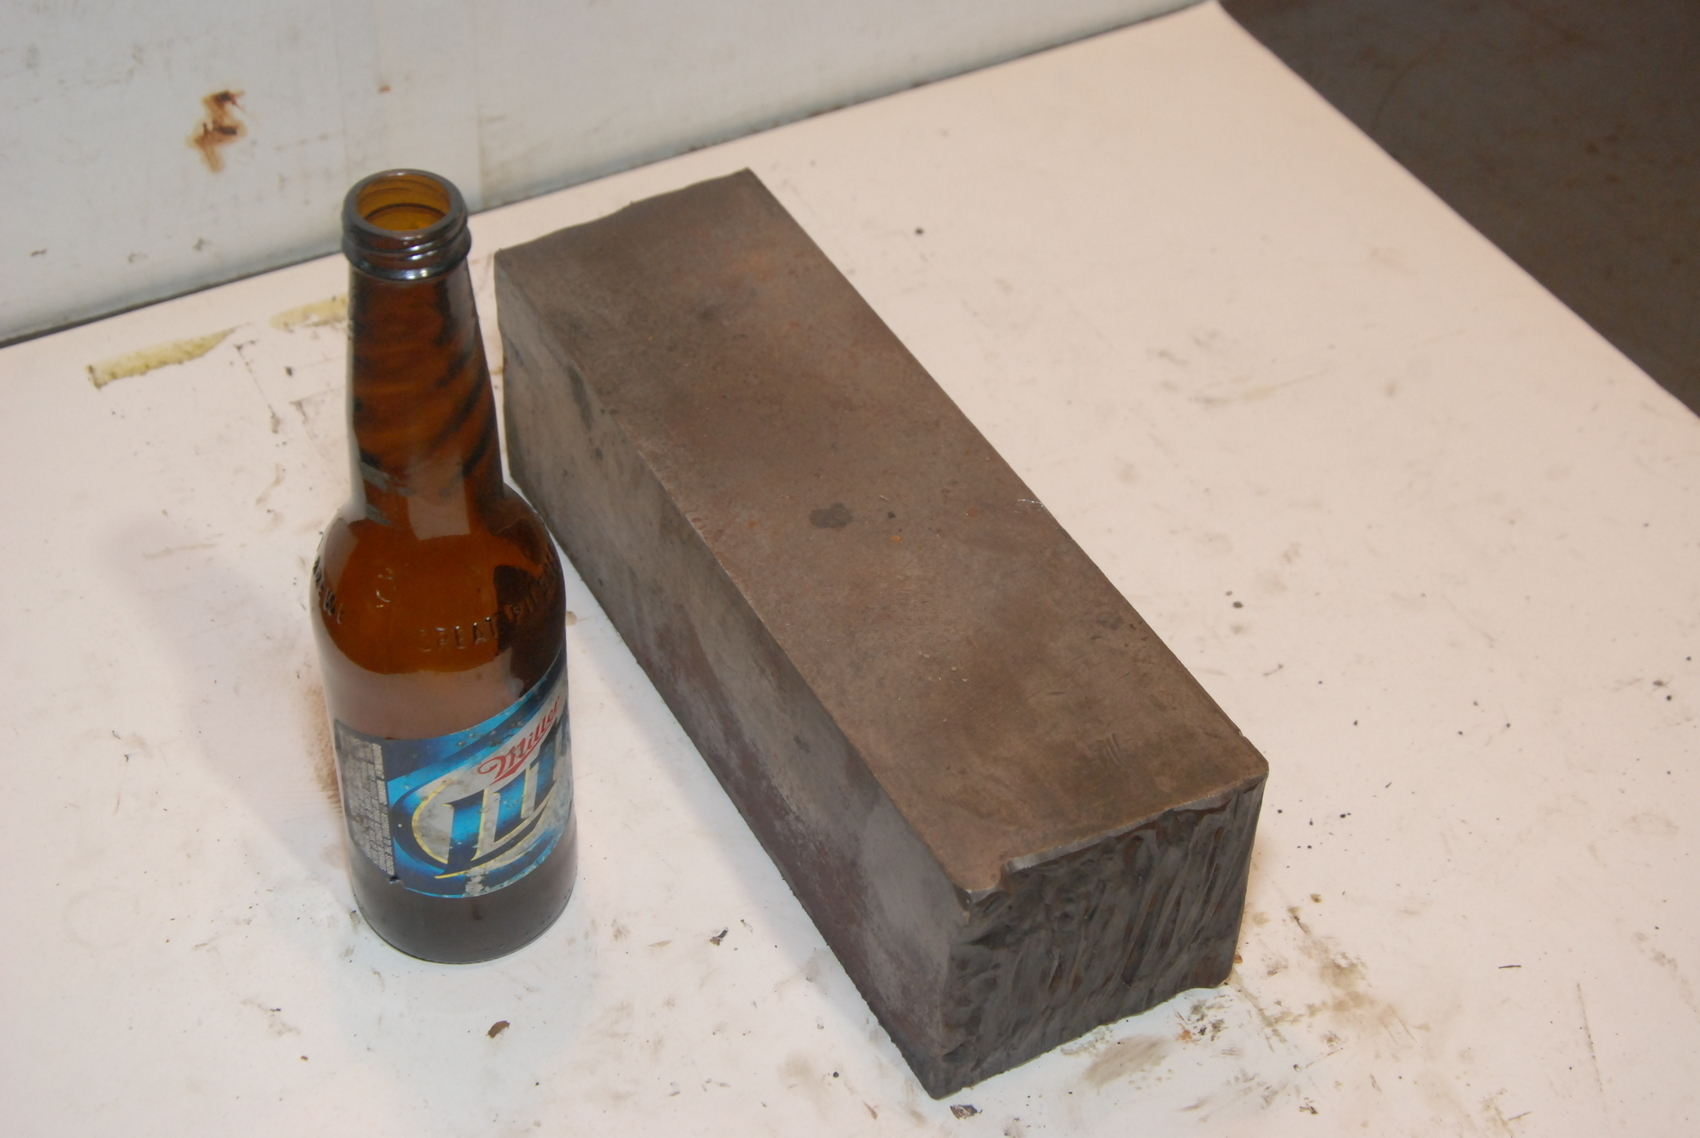 Steel Rectangular Bar for blacksmith anvil,11*3.5*3.5,37lbs